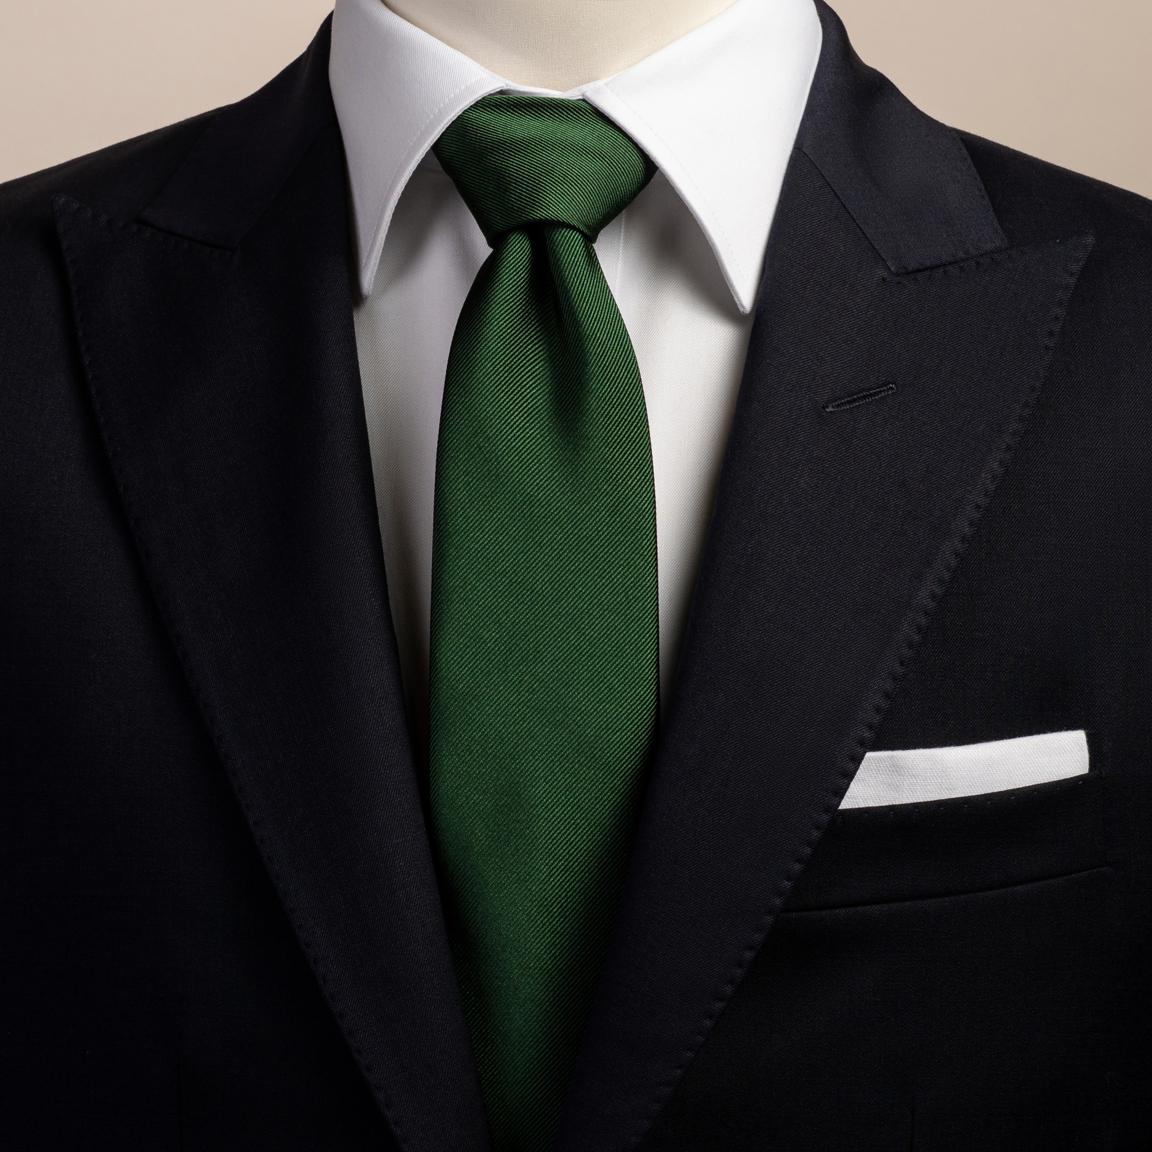 Cravate en soie verte